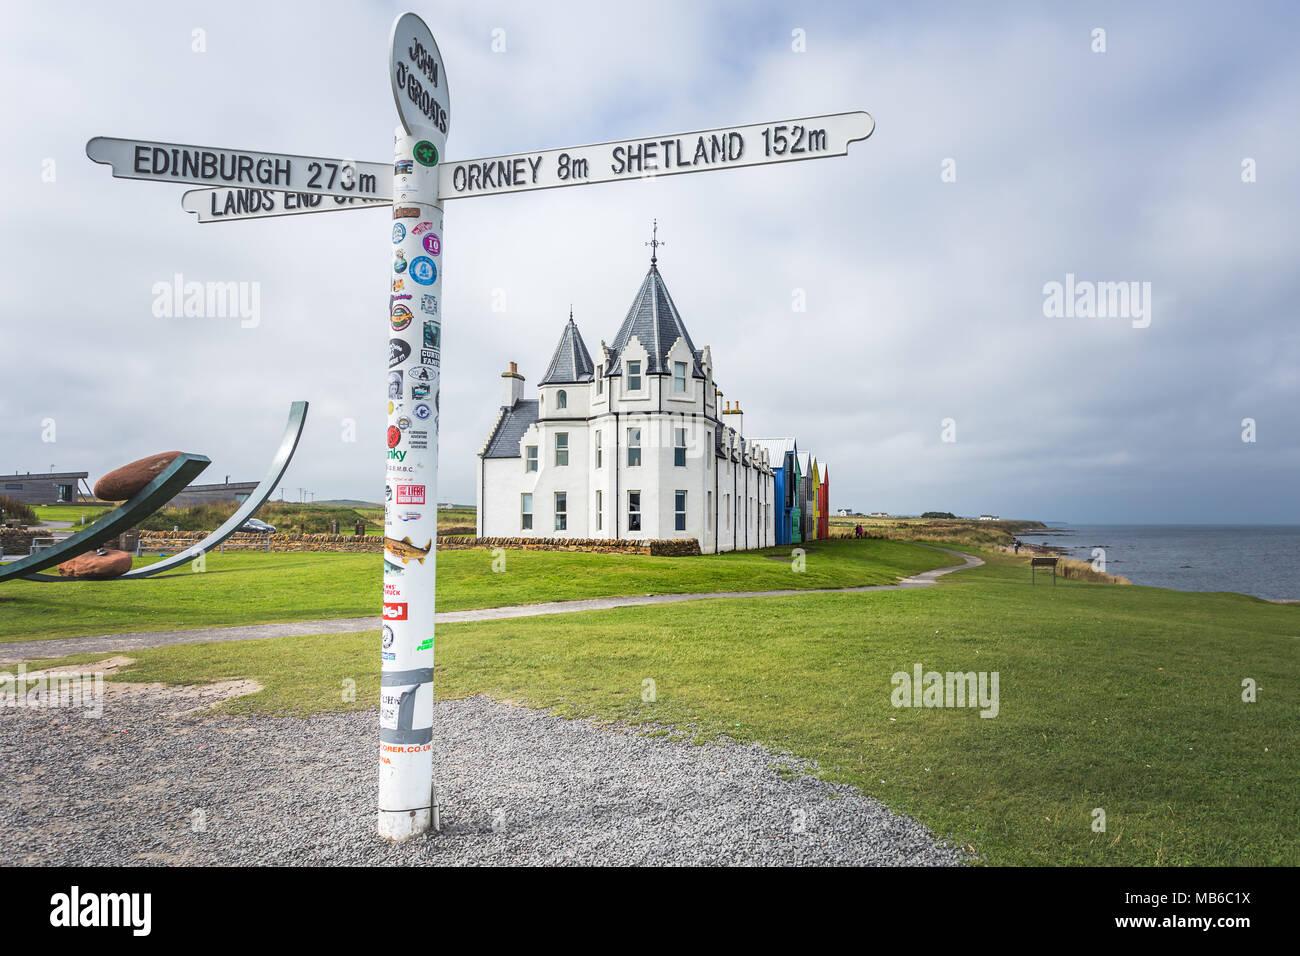 John o groats signpost, Scotland, Great Britain Stock Photo